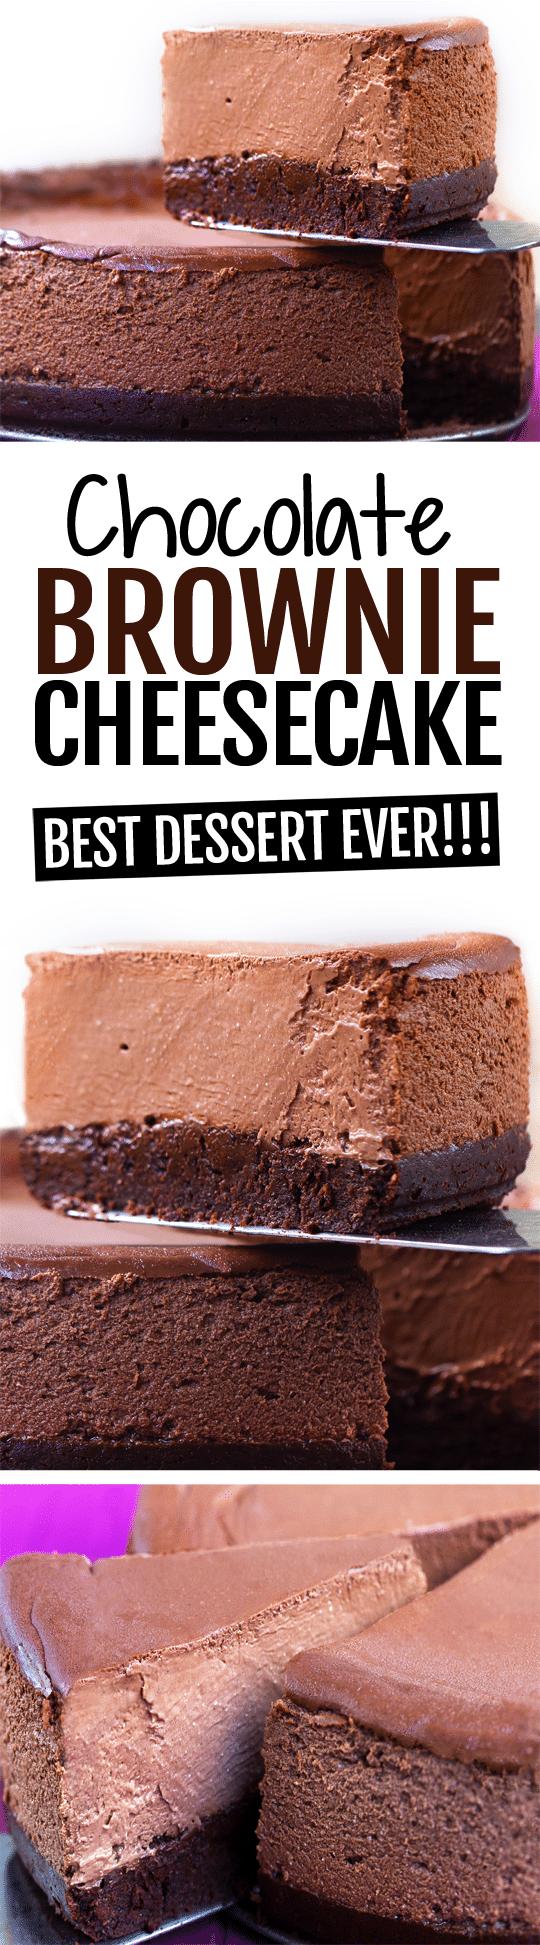 The Ultimate Creamy Chocolate Brownie Cheesecake Recipe